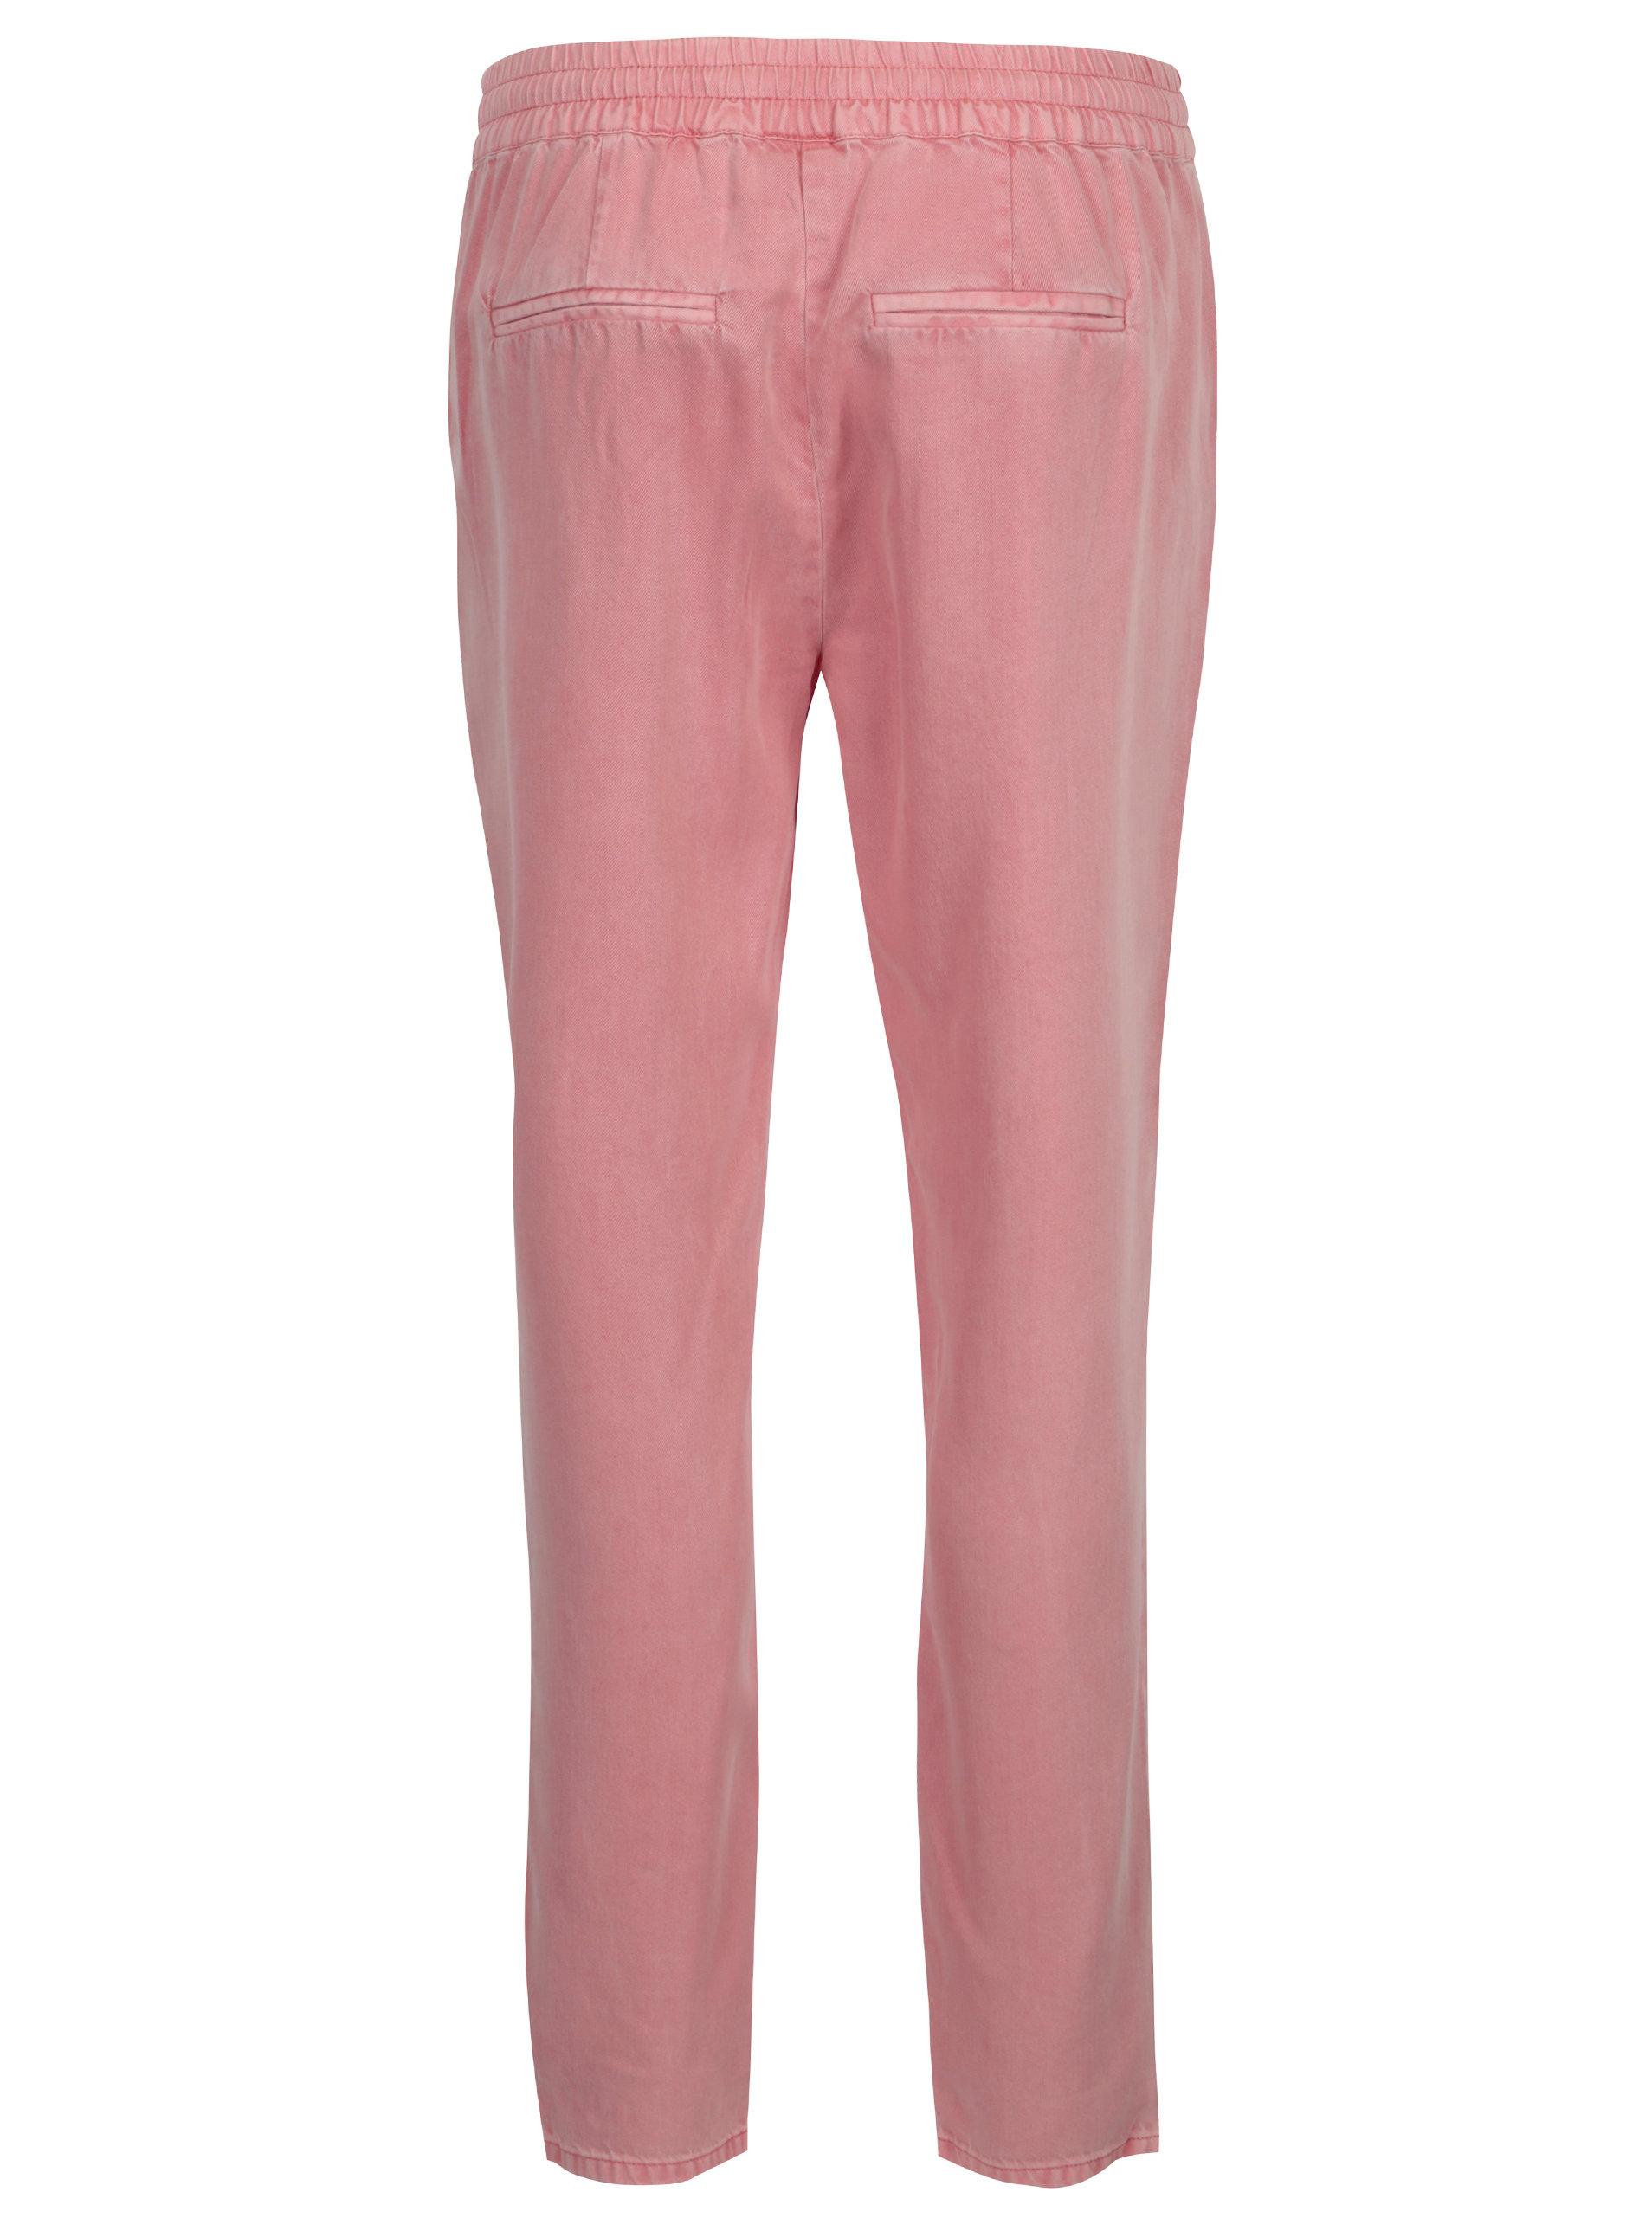 d71dd2acee2c Ružové nohavice VEOR MODA Rory ...